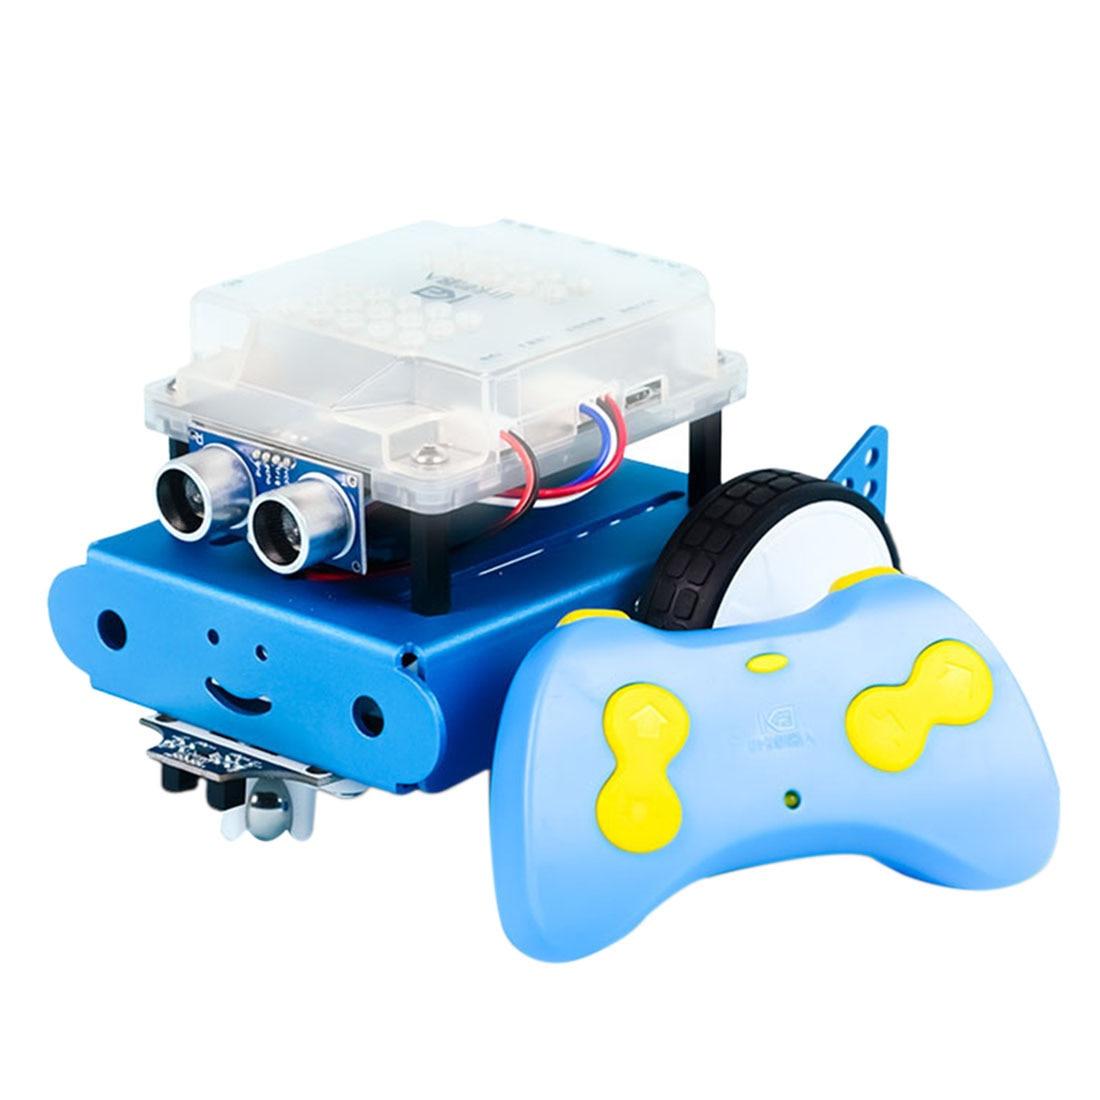 MODIKER DIY High Tech Smart Robot Car Kit APP Control Obstacle Avoidance Line-tracking Ultrasonic Sensor Programmable Toys